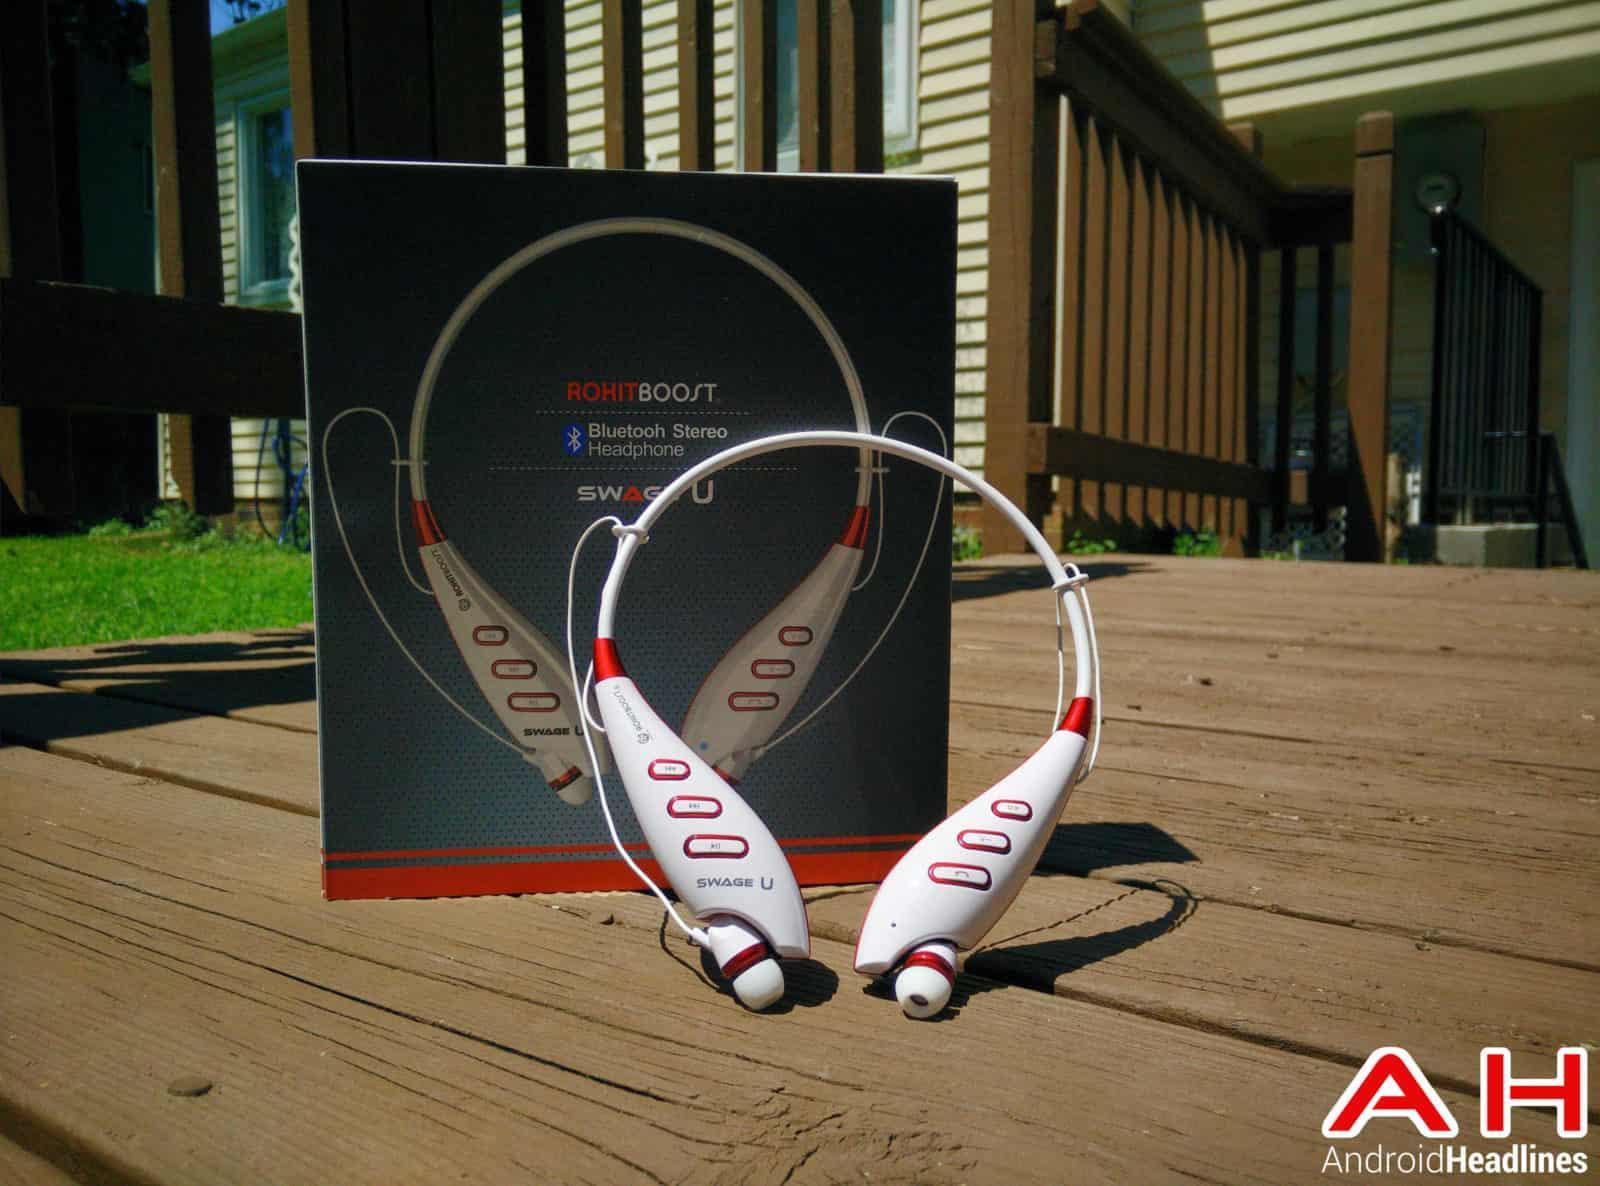 rokit boost swageu bluetooth headset3